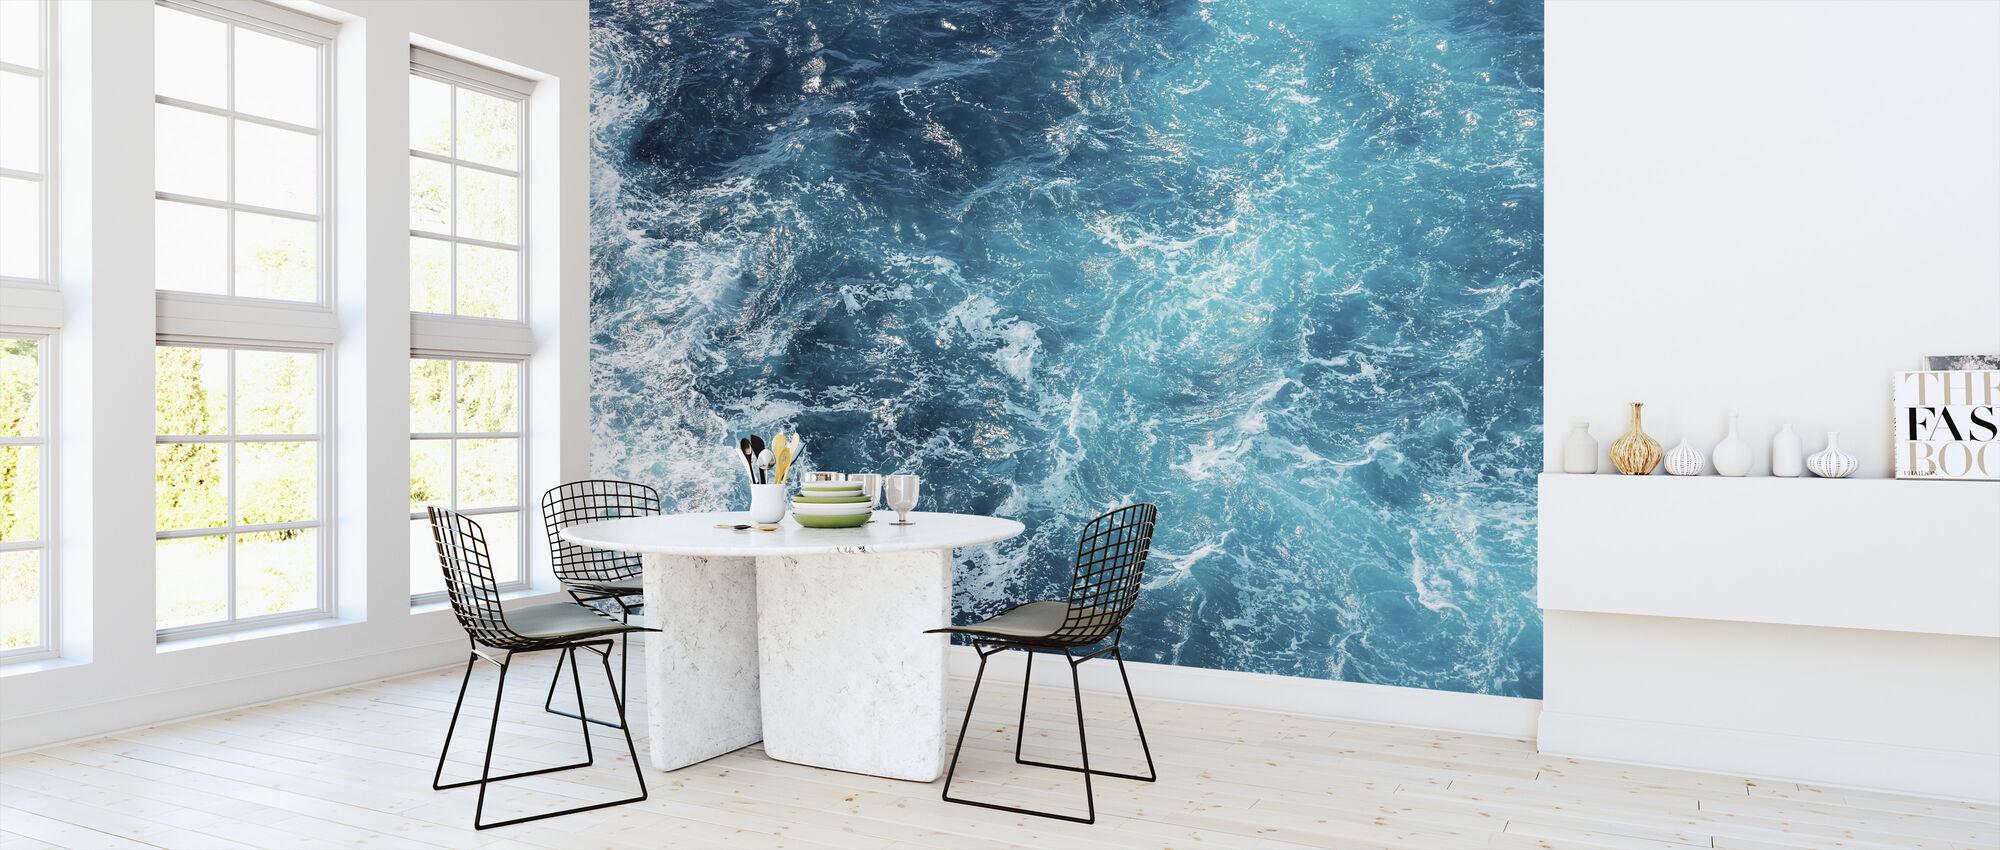 Grova havsvågor - Tapet - Kök